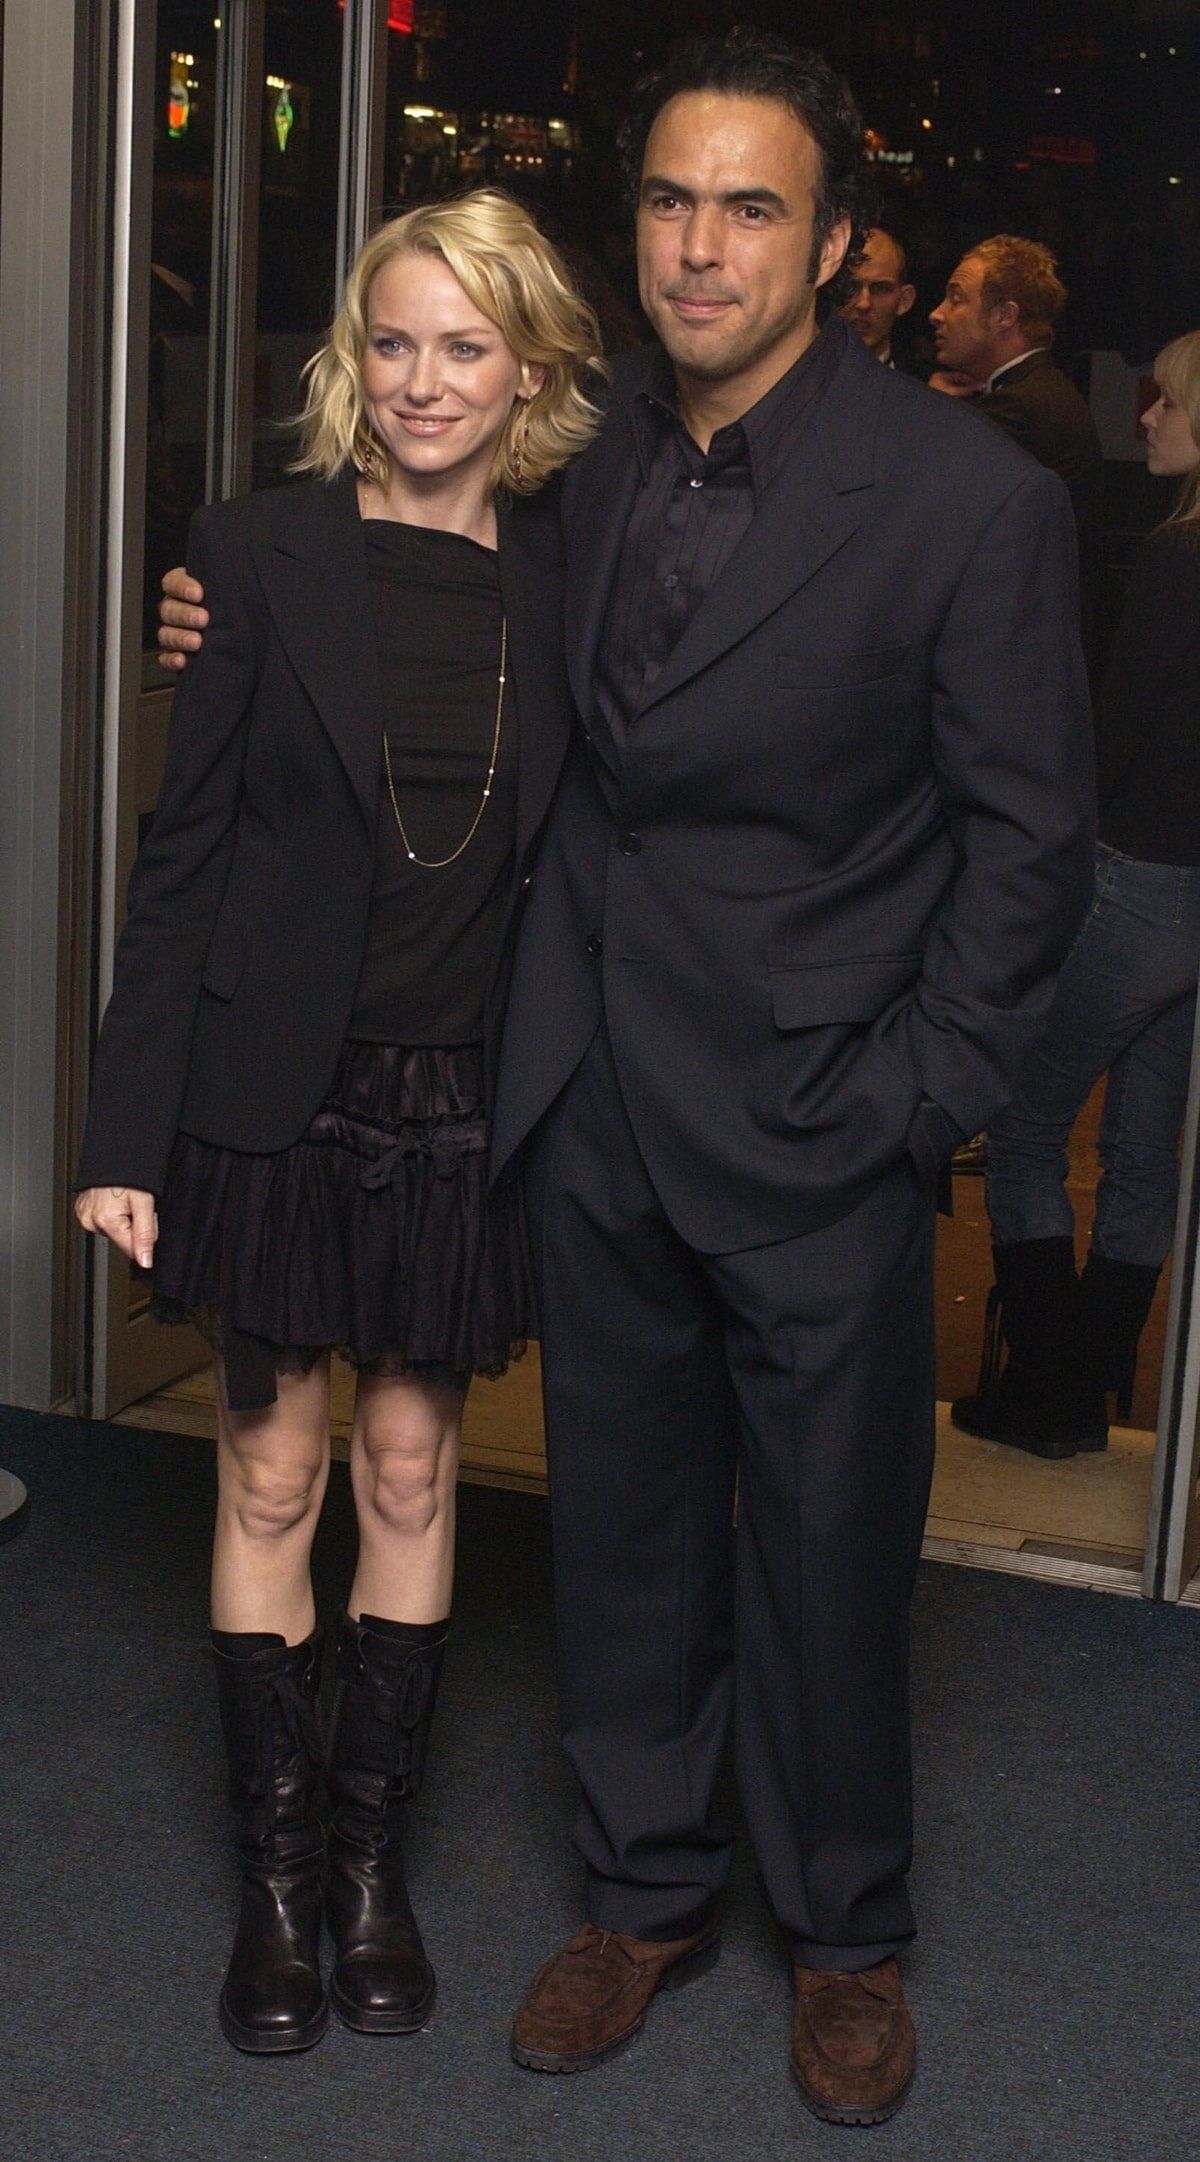 Naomi Watts and Alejandro Gonzalez Inarritu attend the premiere of 21 Grams